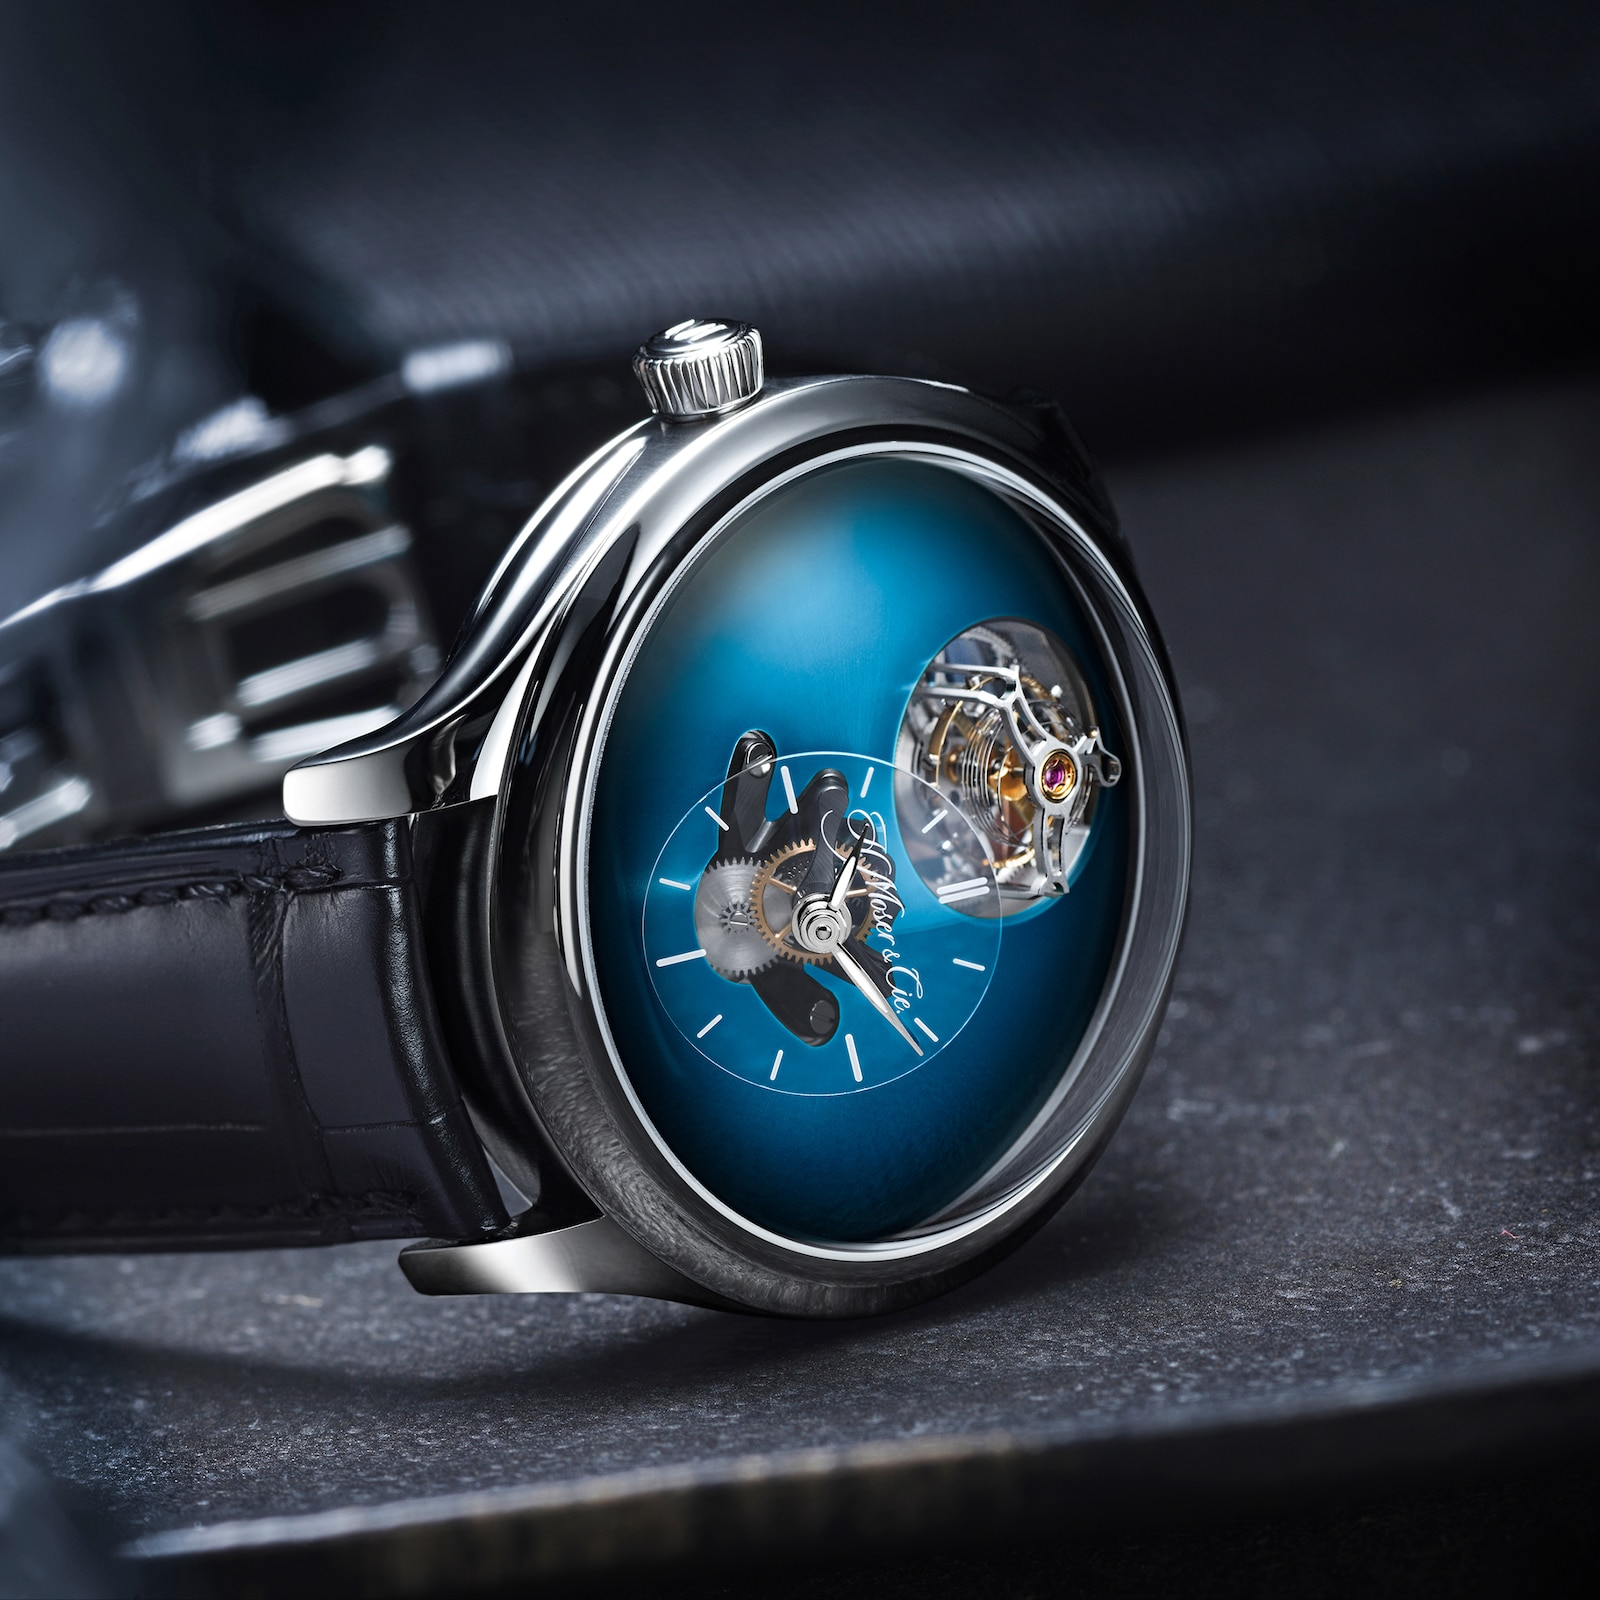 H. Moser & Cie Endeavour Cylindrical Tourbillon Aqua Blue